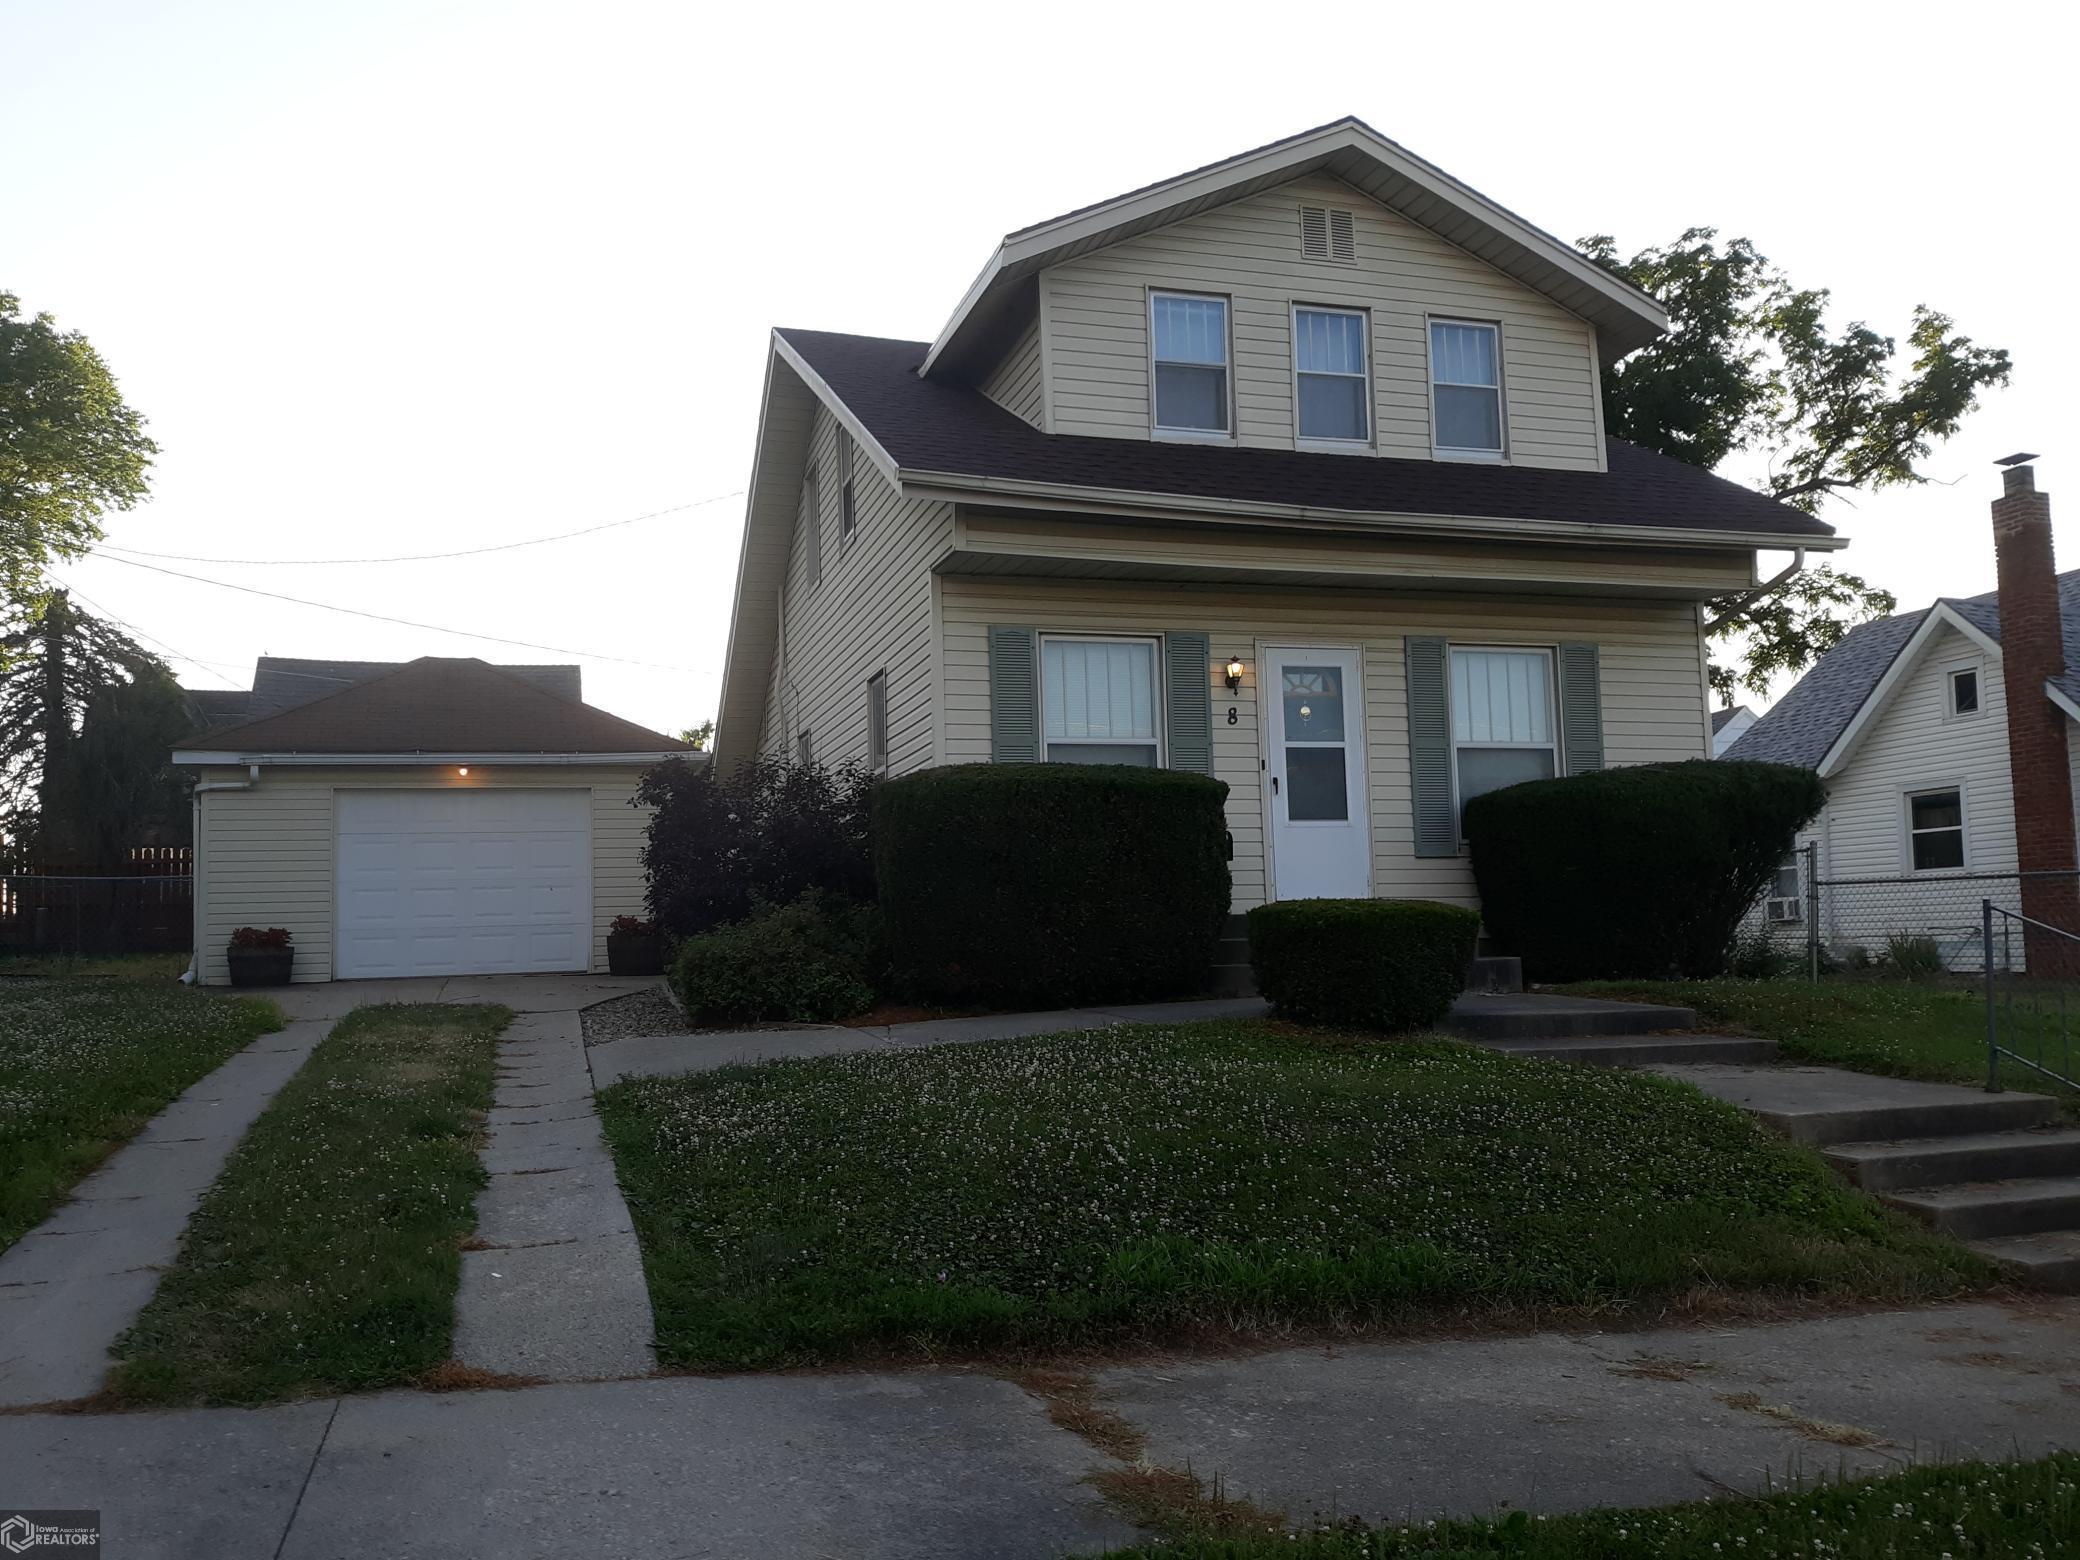 8 11th Property Photo - Marshalltown, IA real estate listing